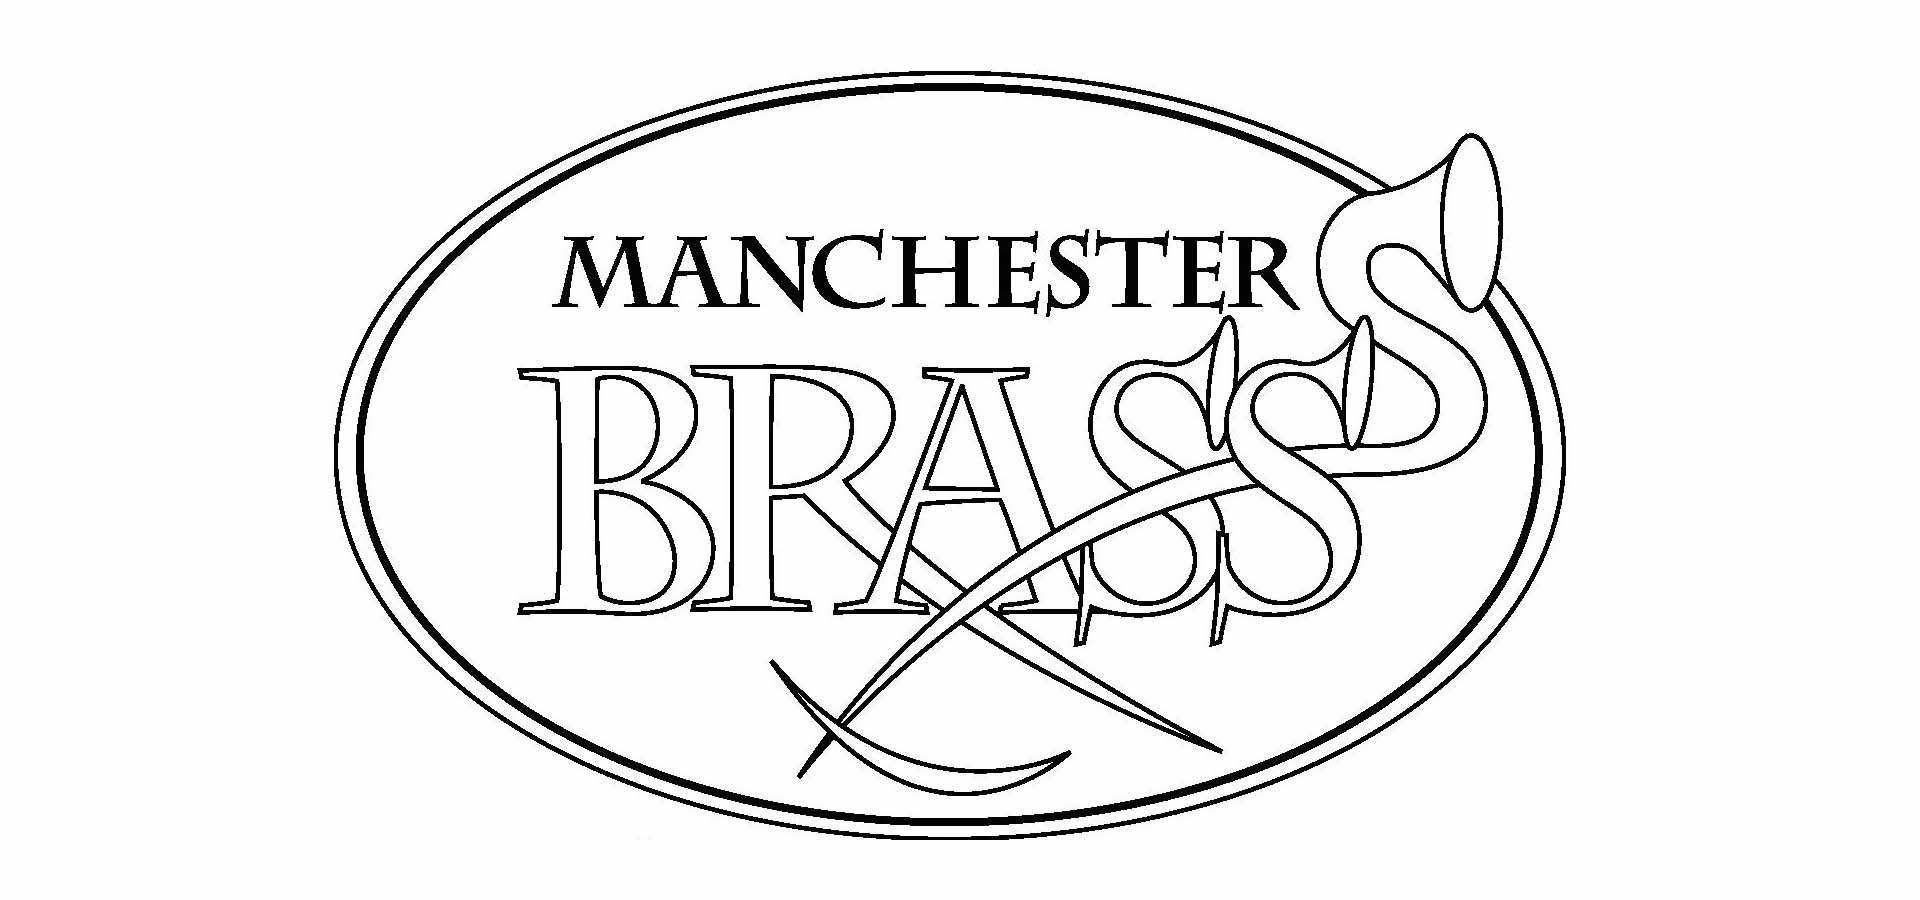 Fultone Brass - Manchester Brass - Trumpets Cornets Flugelhorns and Pocket Trumpets